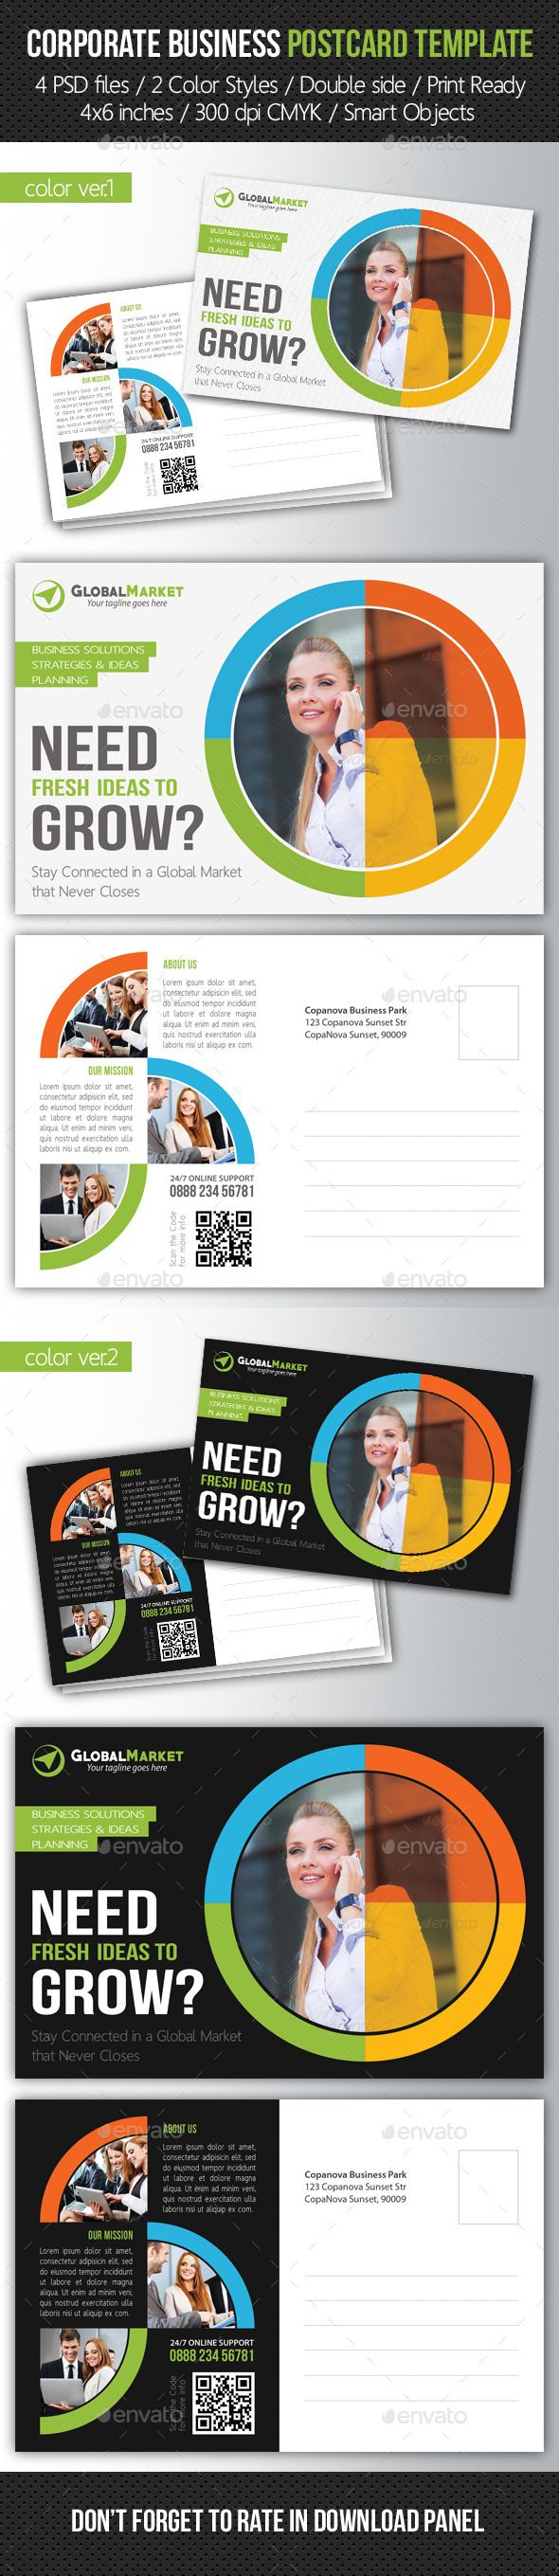 Corporate Business Postcard Template #design Download: http://graphicriver.net/item/corporate-business-postcard-template-v03/10253301?ref=ksioks